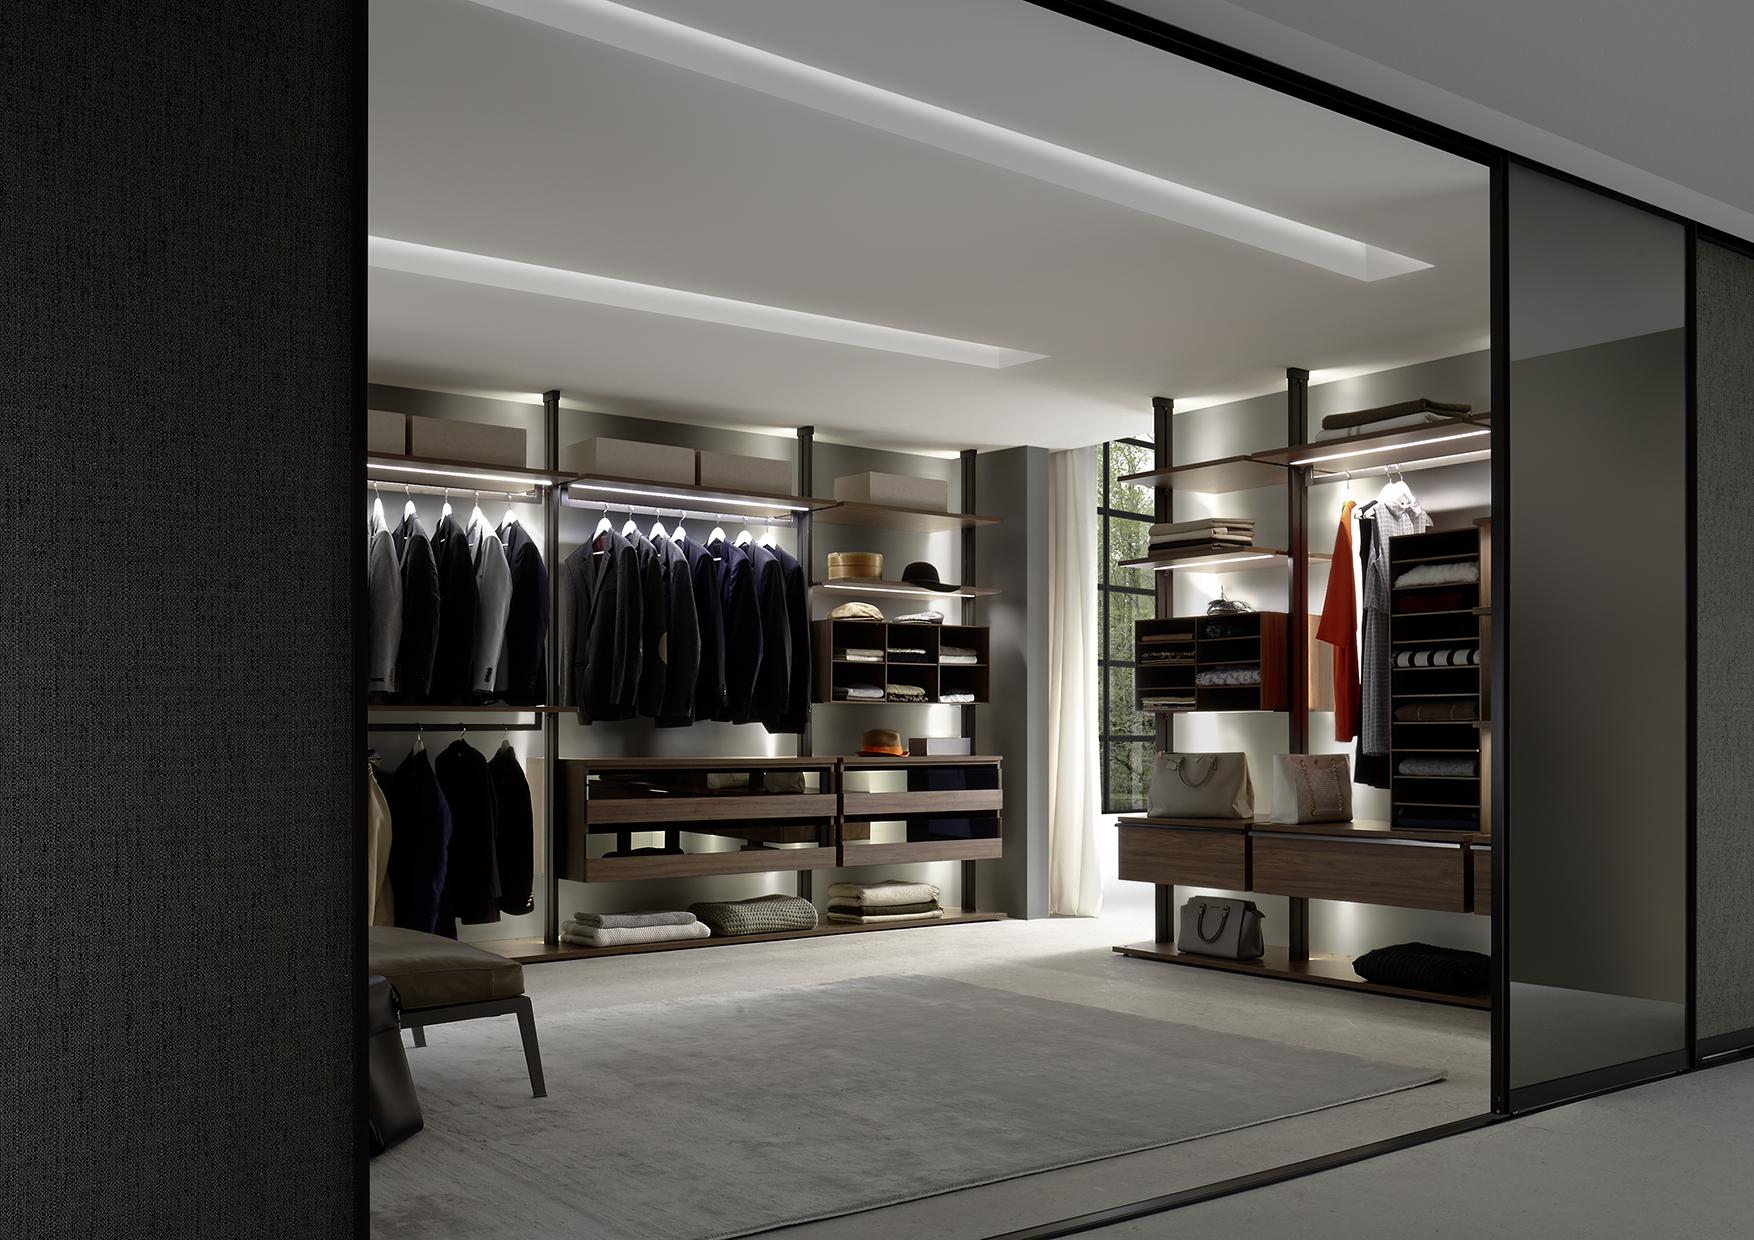 Centric garderob